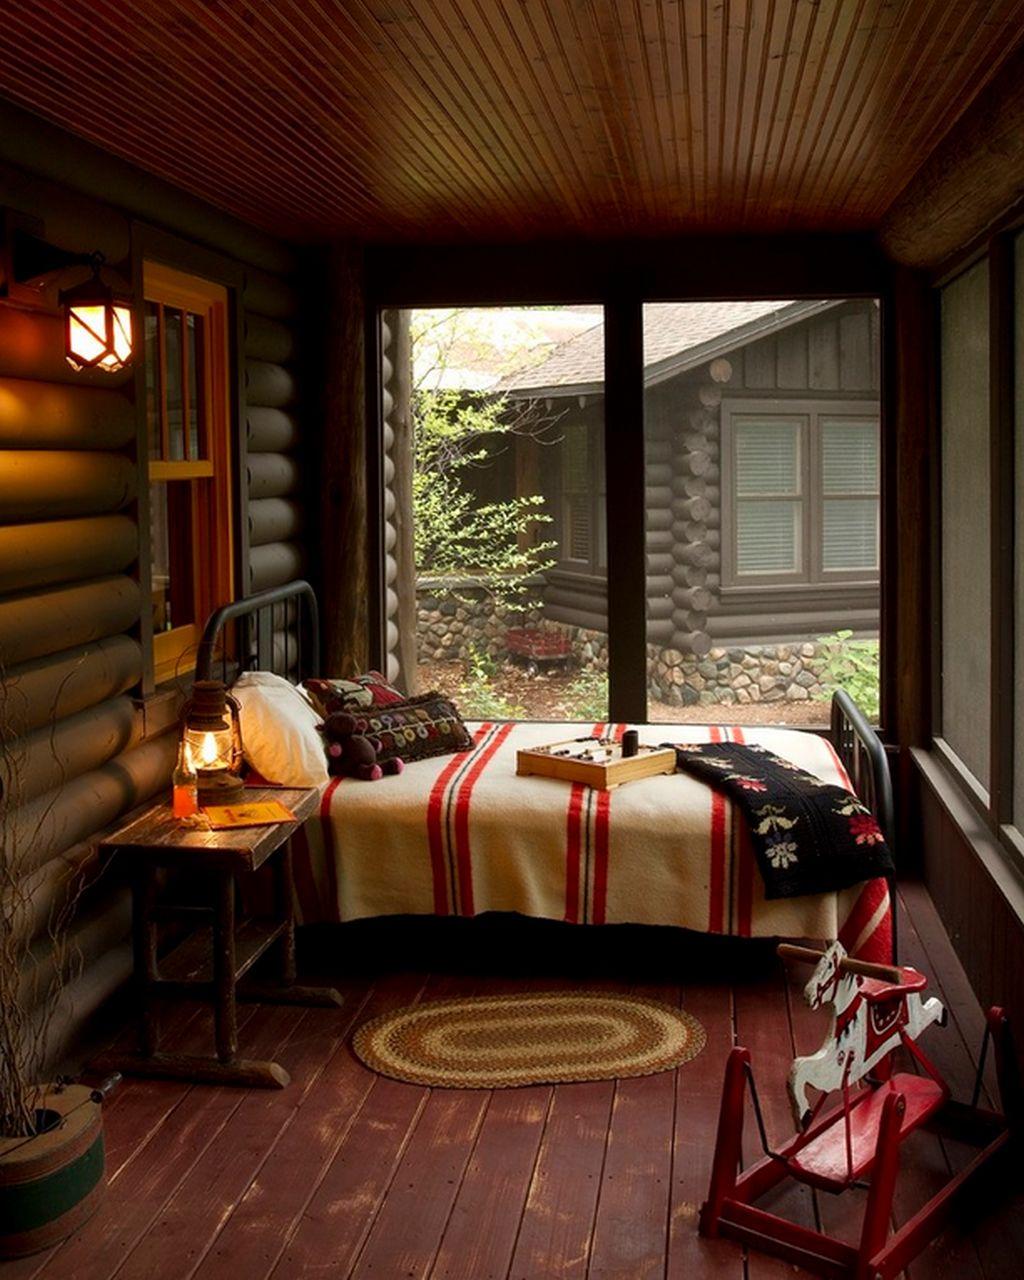 Cabana De Lemn Cu Interior Rustic Adela Parvu Interior Design Blogger